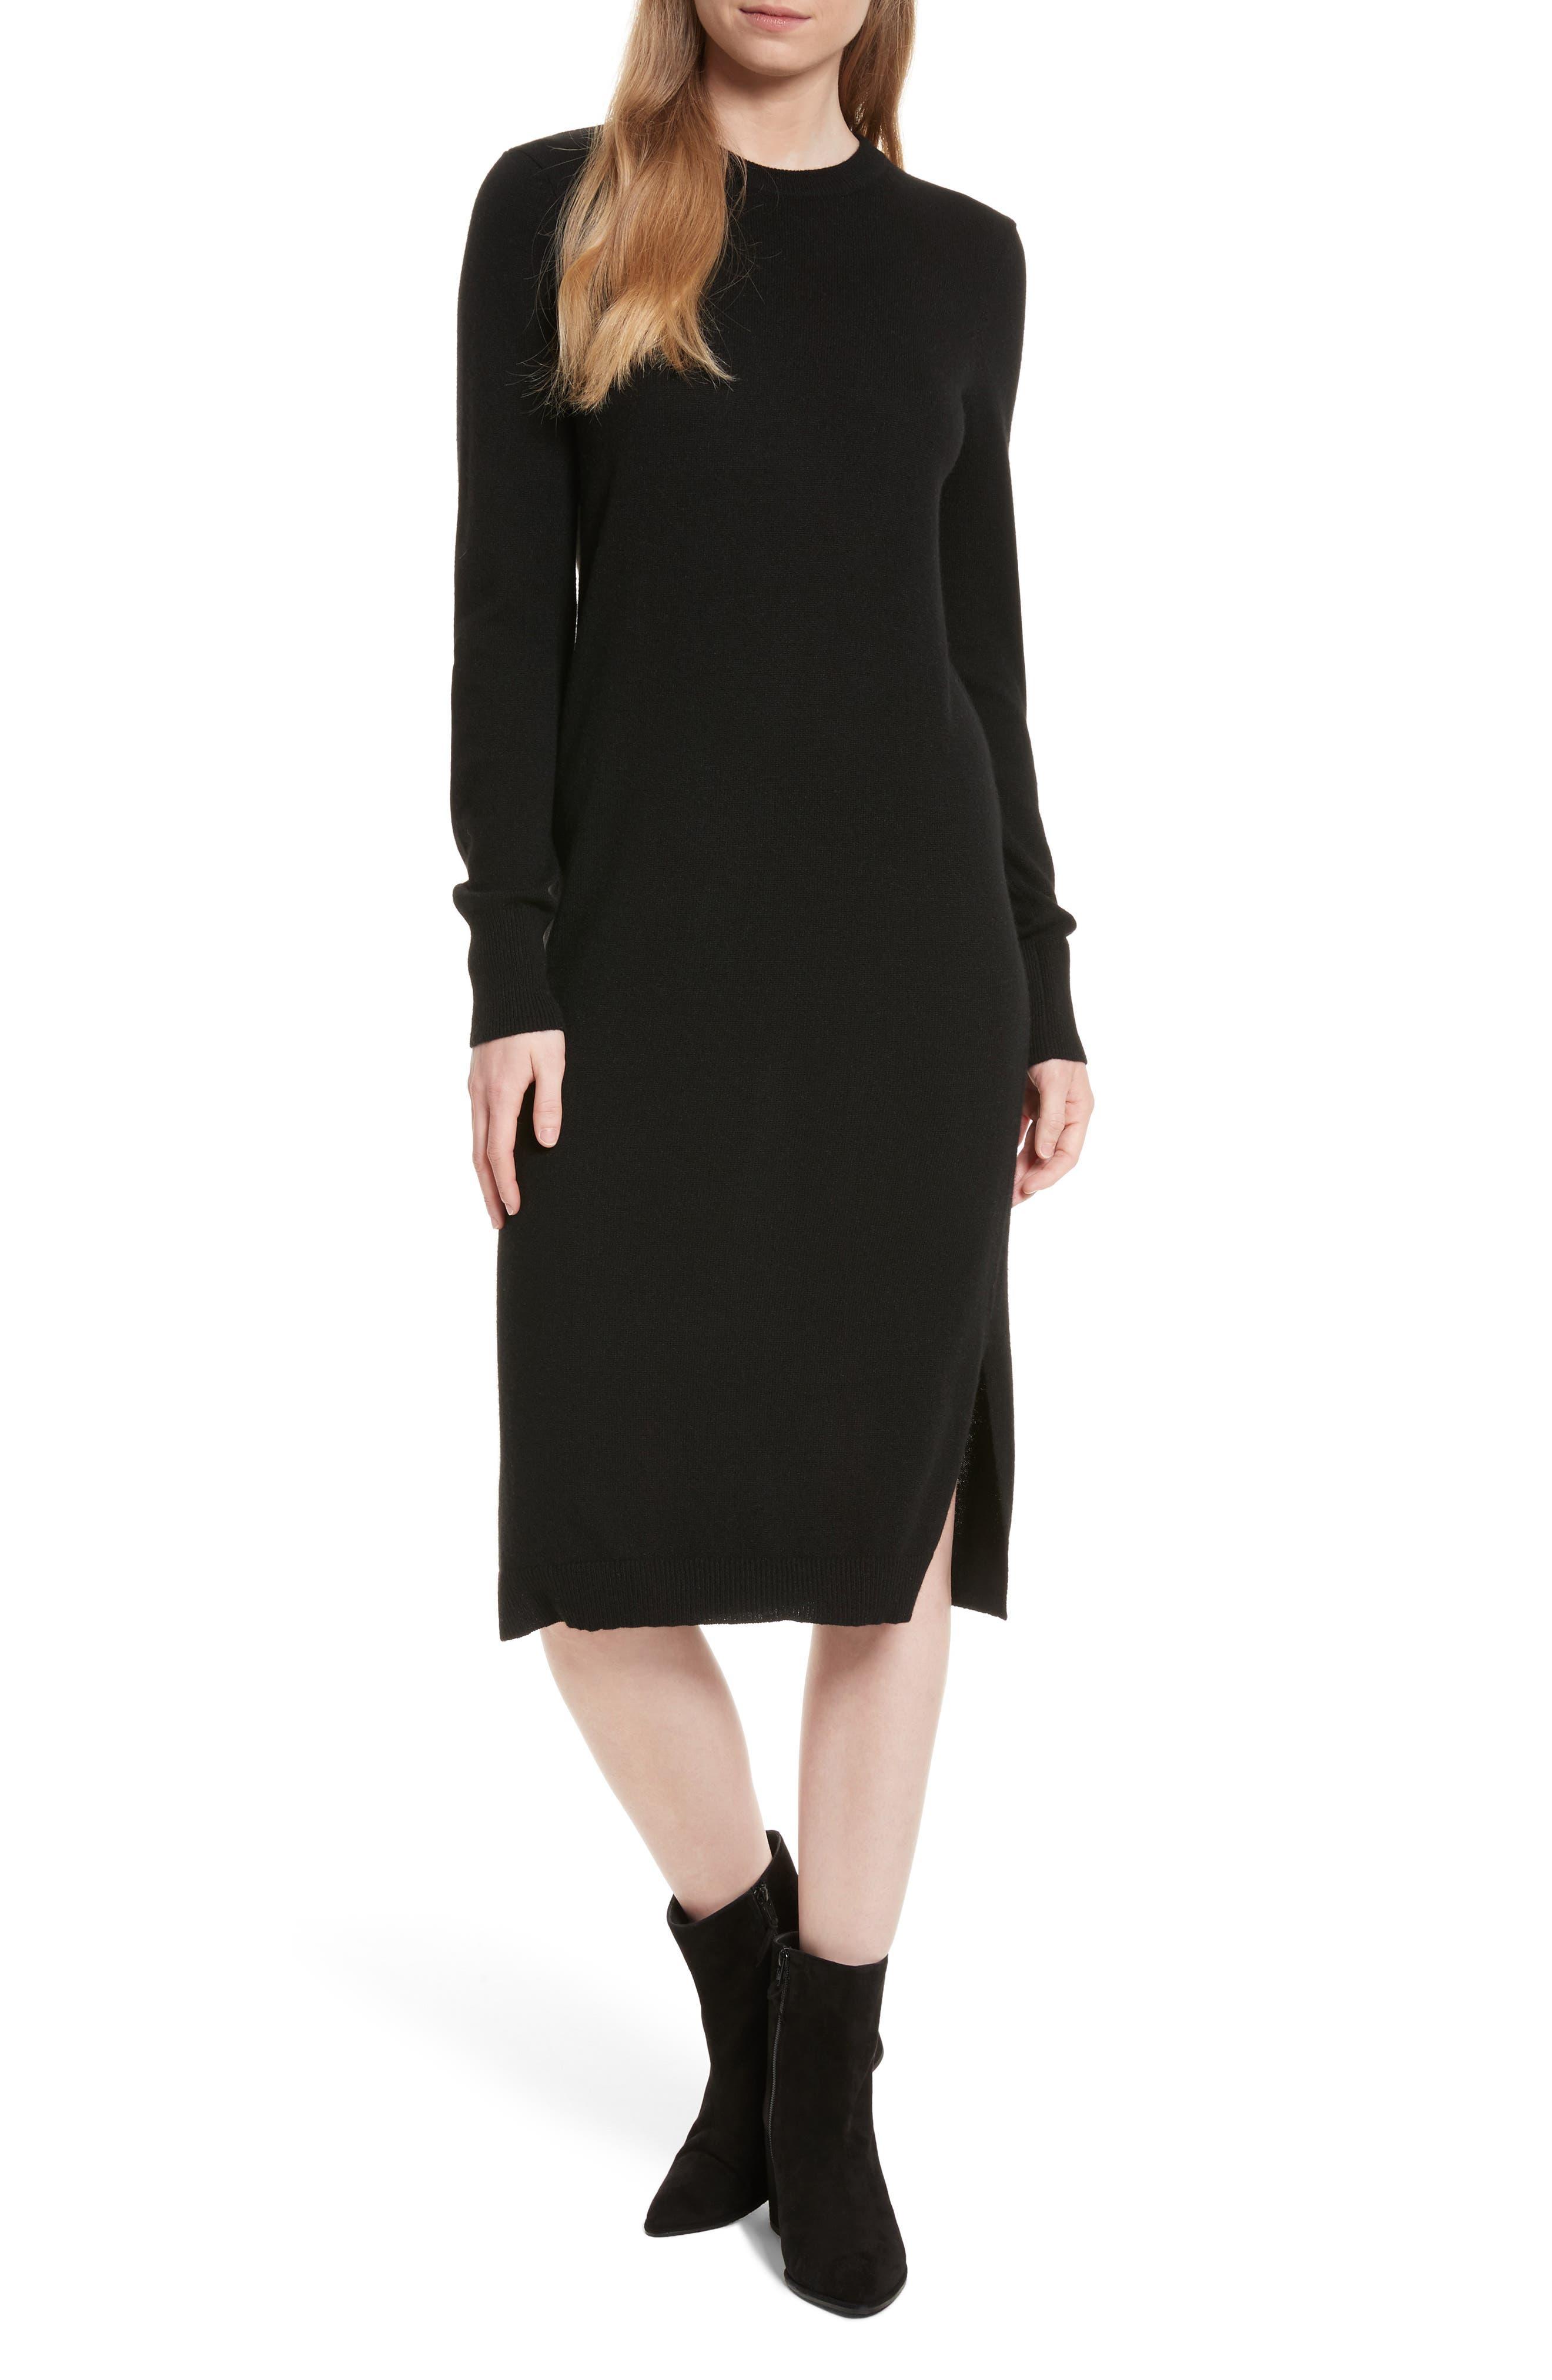 Snyder Cashmere Knit Midi Dress,                             Main thumbnail 1, color,                             001